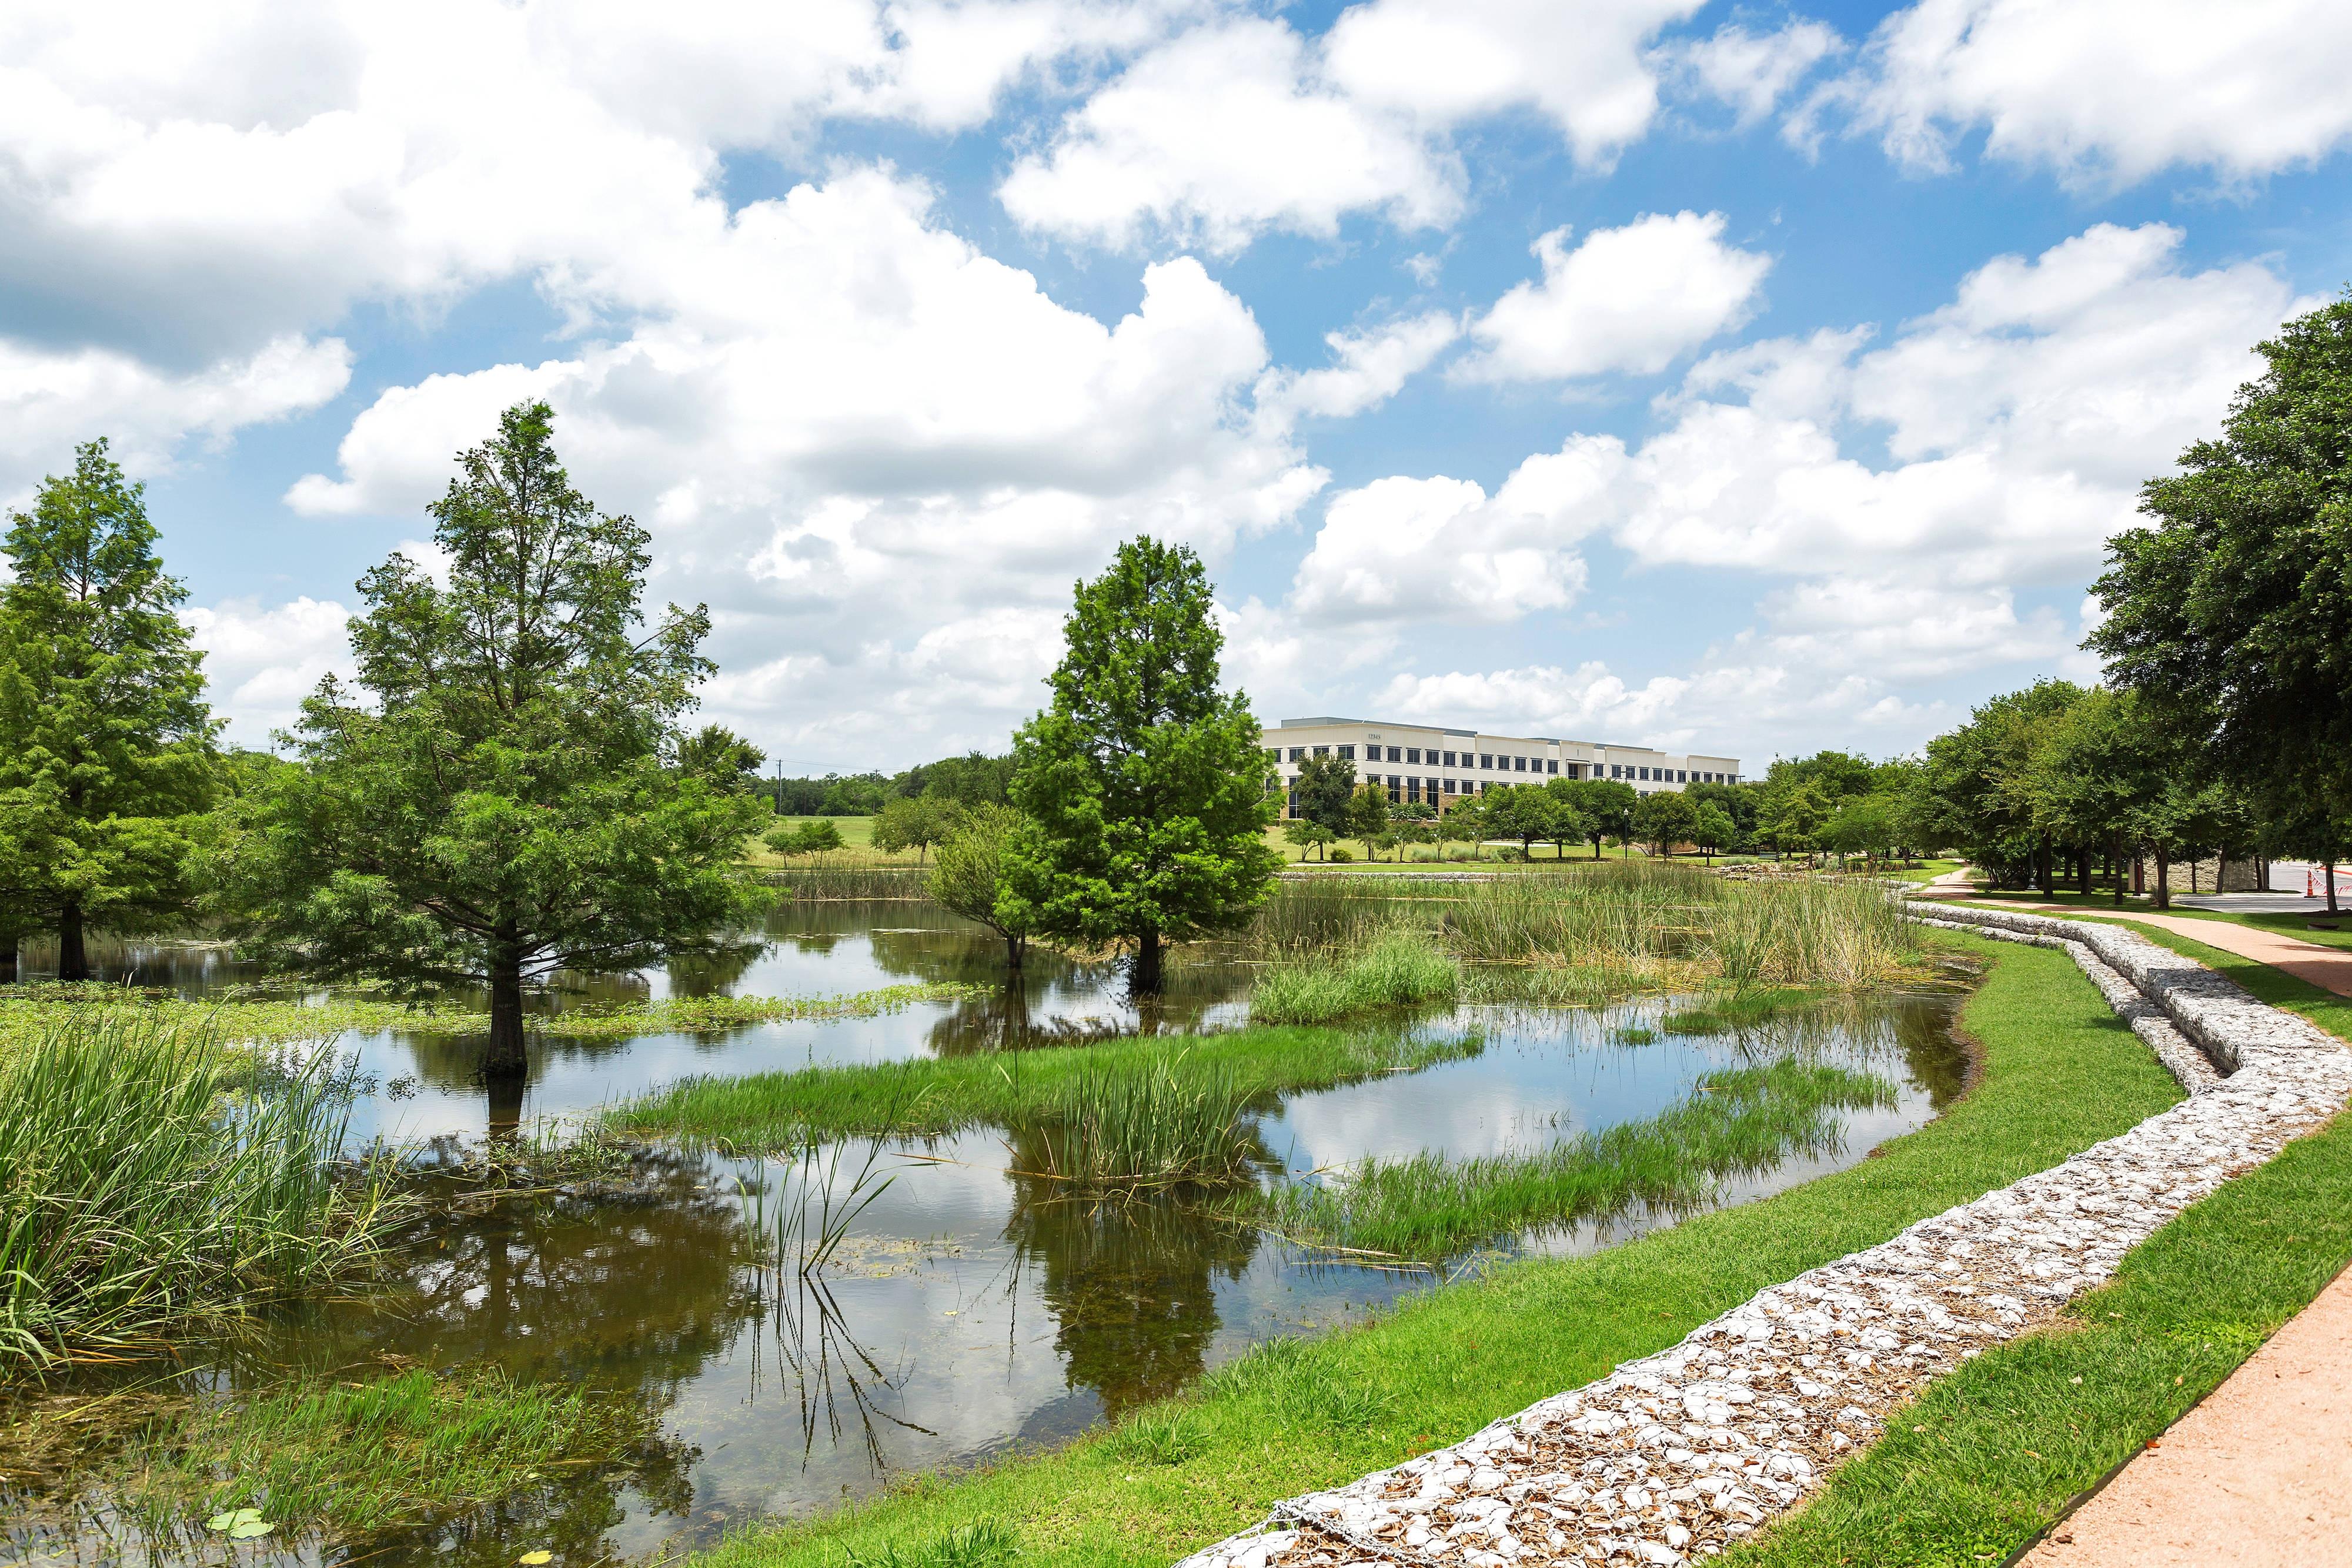 Park Central Pond